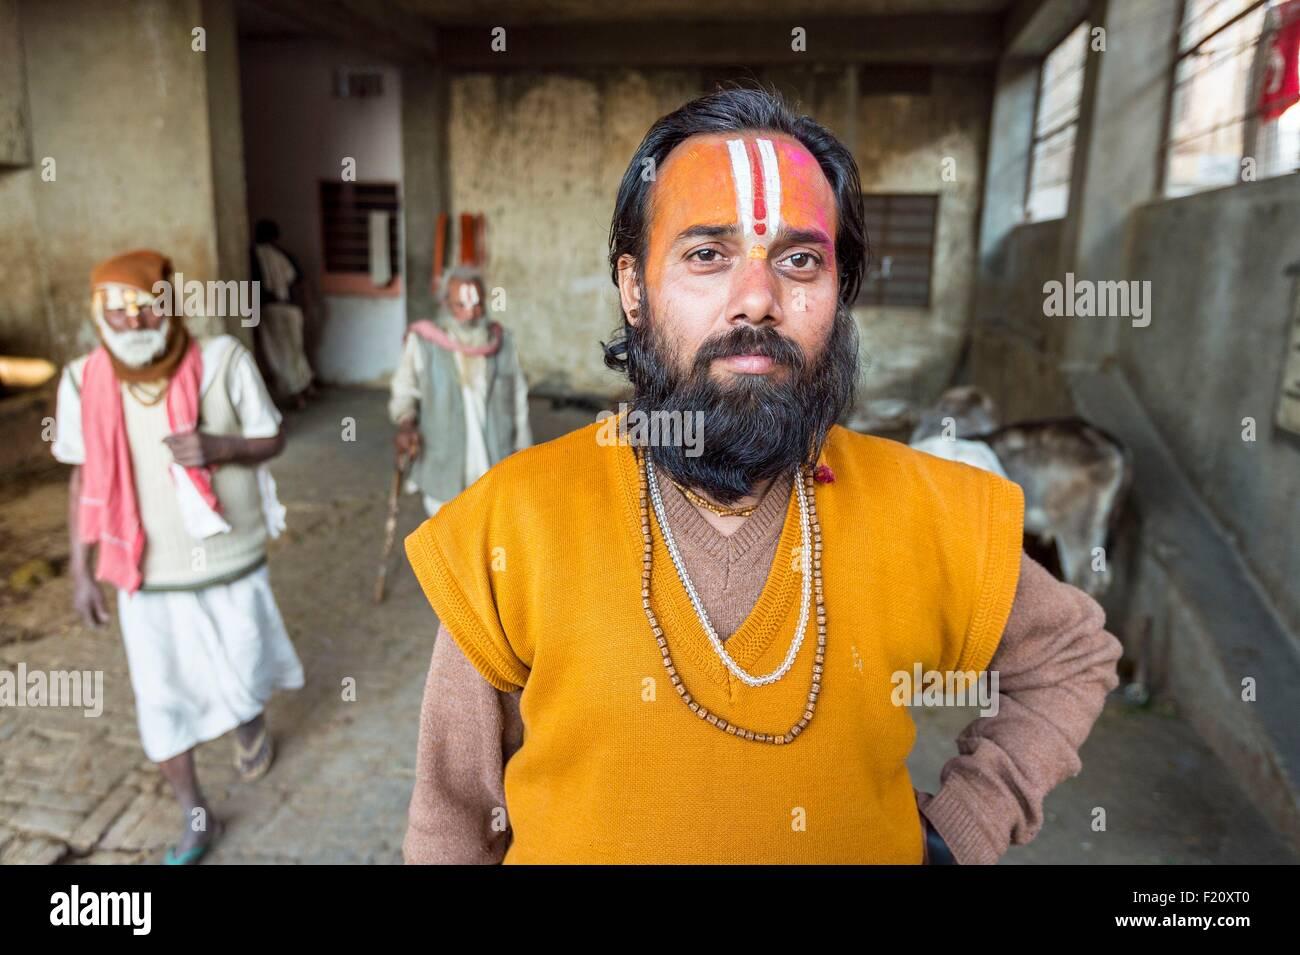 India, Rajasthan state, Jaipur, sadhus at the ashram of the Hanuman temple in the Galta area - Stock Image